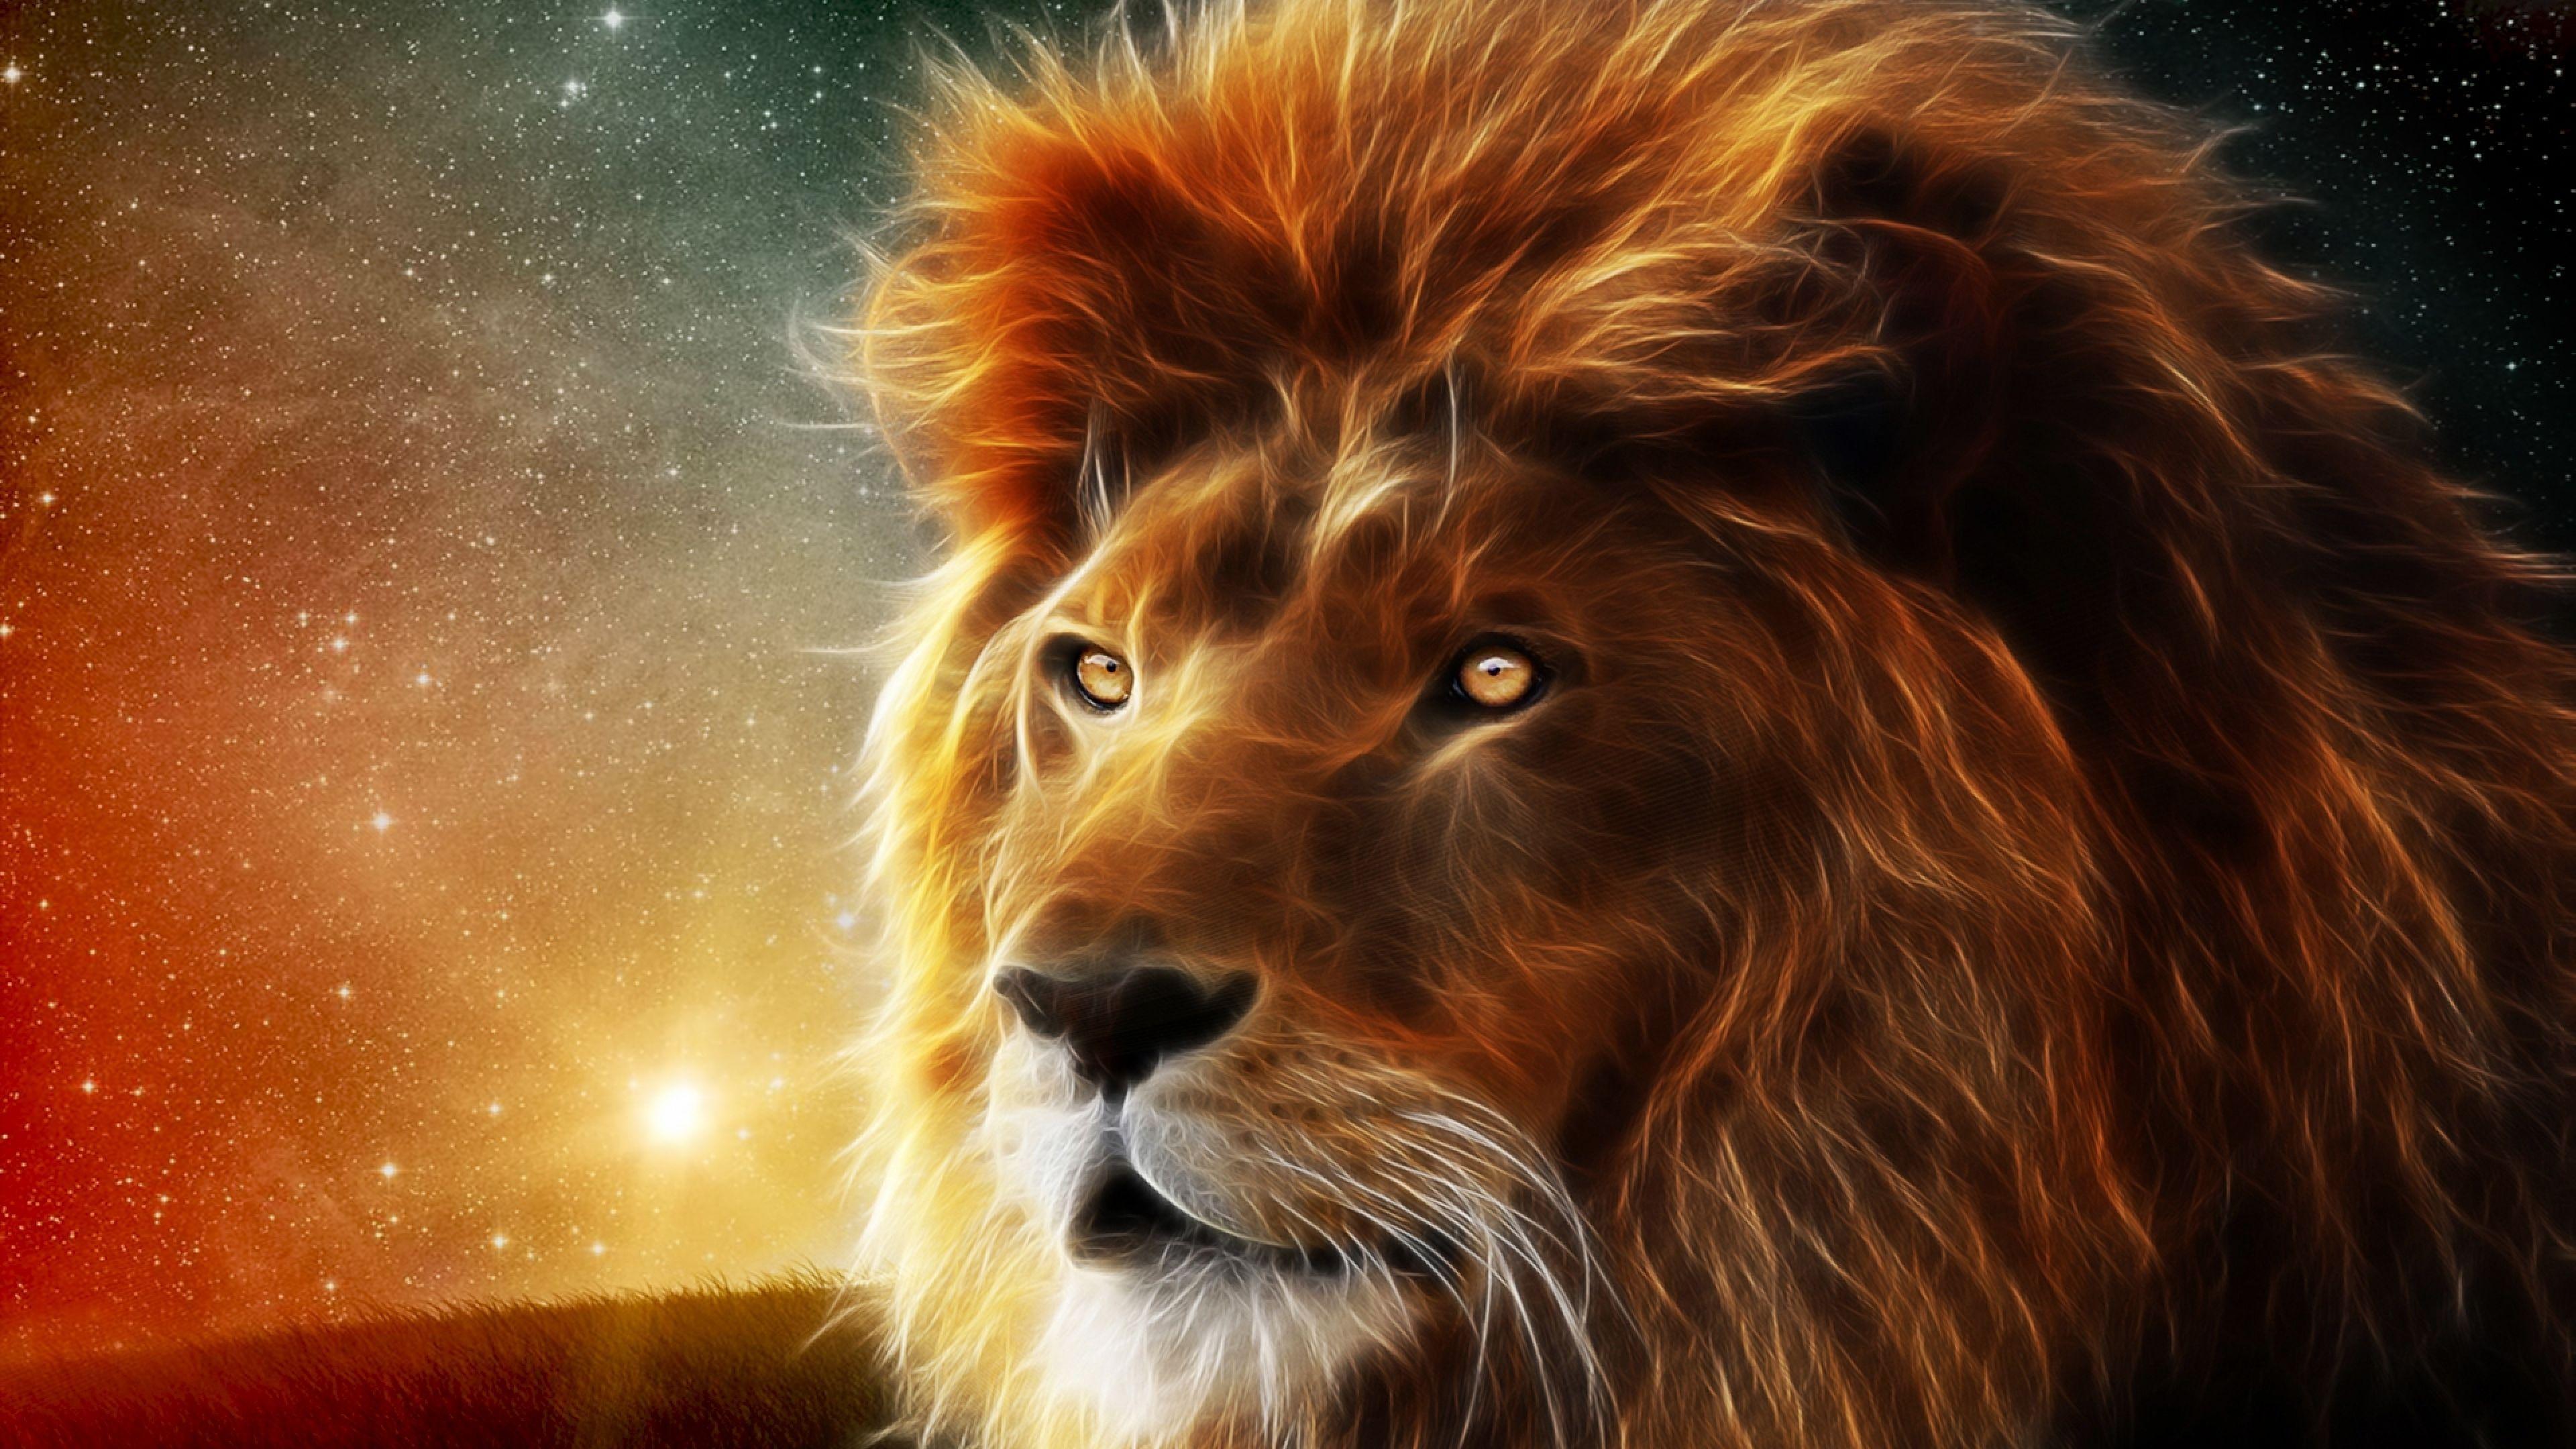 Lion Wallpapers Wallpaper Lion Hd Wallpaper Spirit Animal Lion Wallpaper